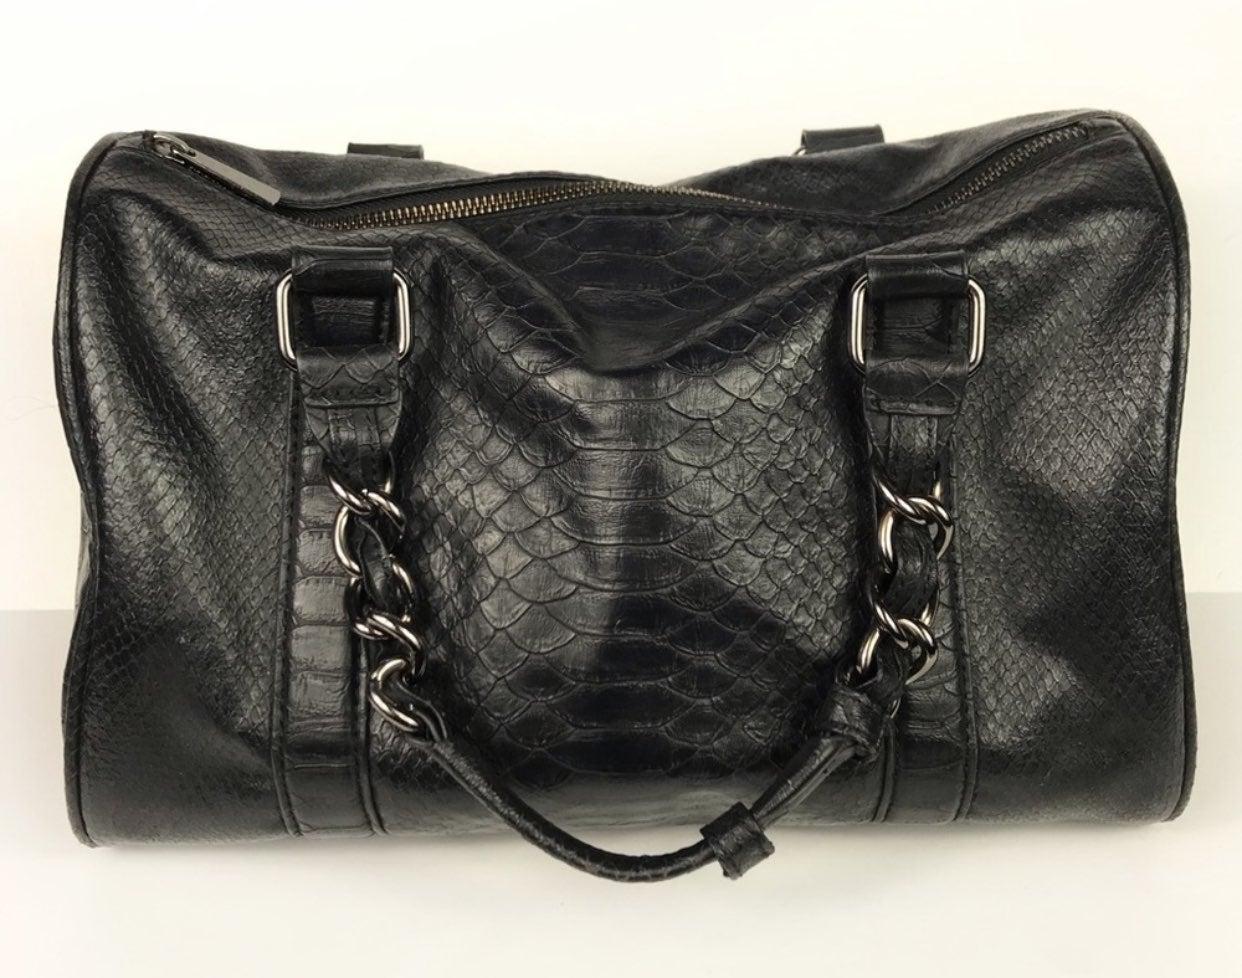 Express Faux Leather Reptile Satchel Bag